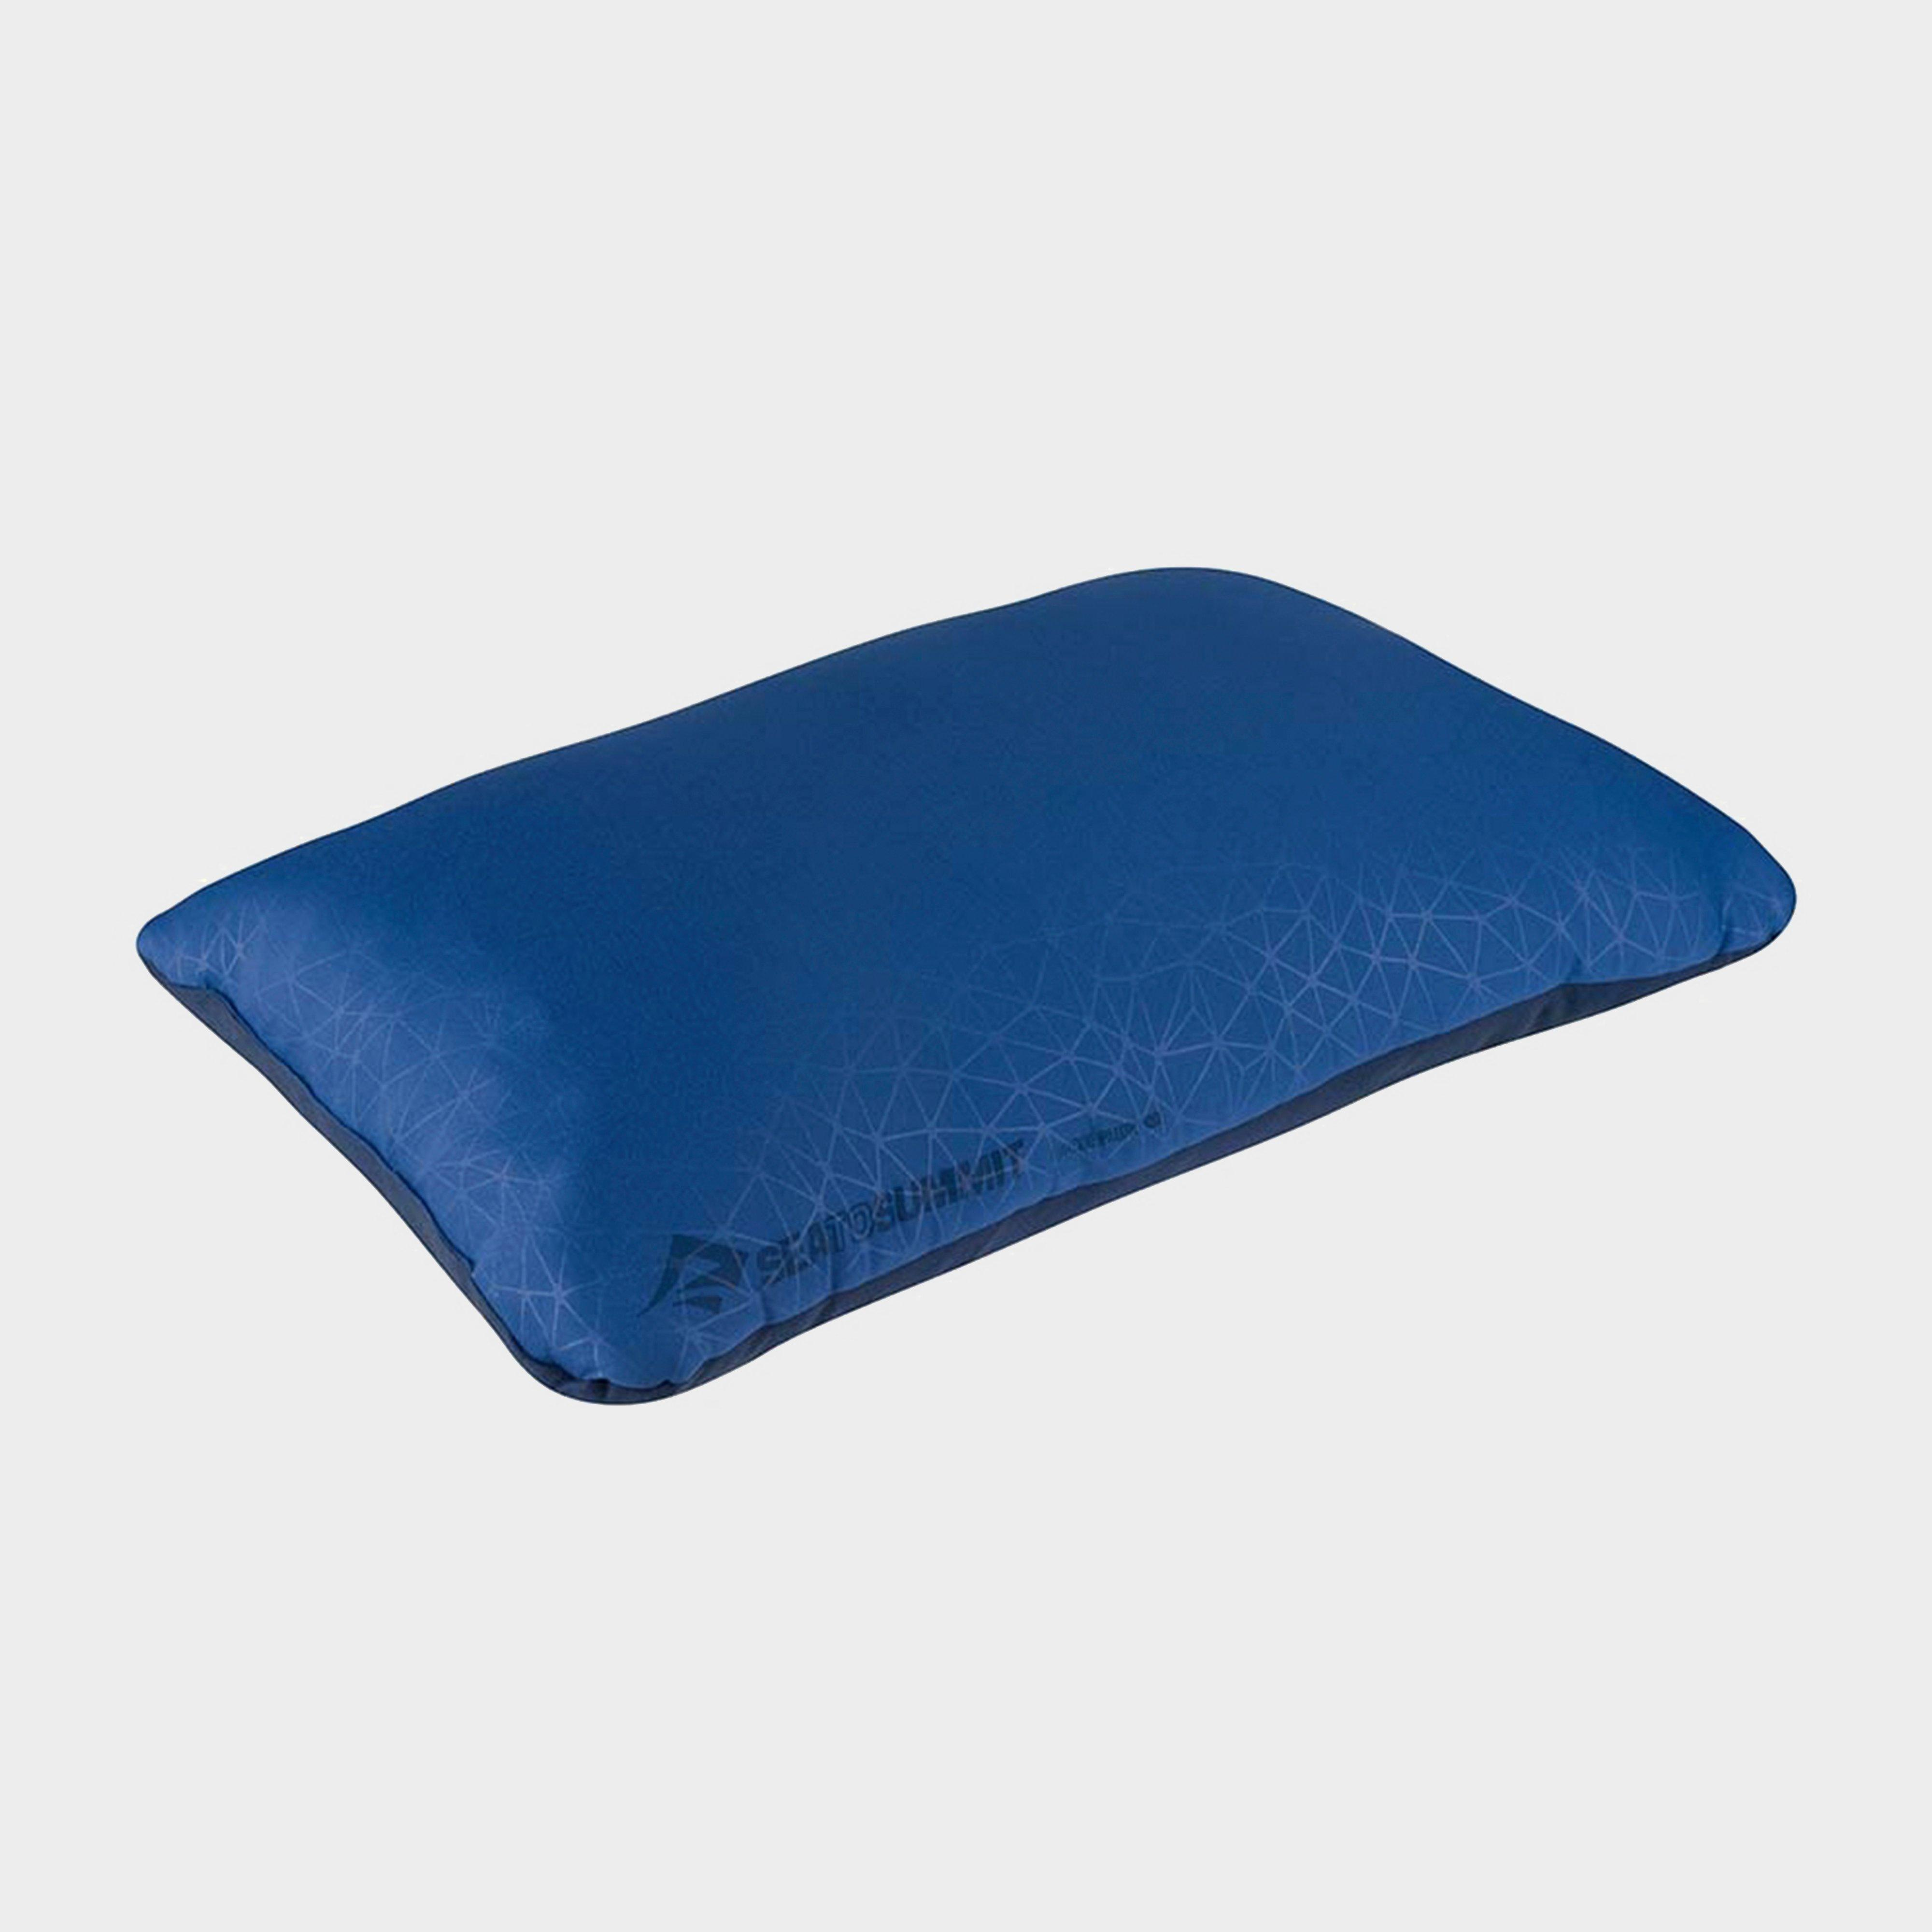 Sea to Summit Sea To Summit Foam Core Pillow (Regular)